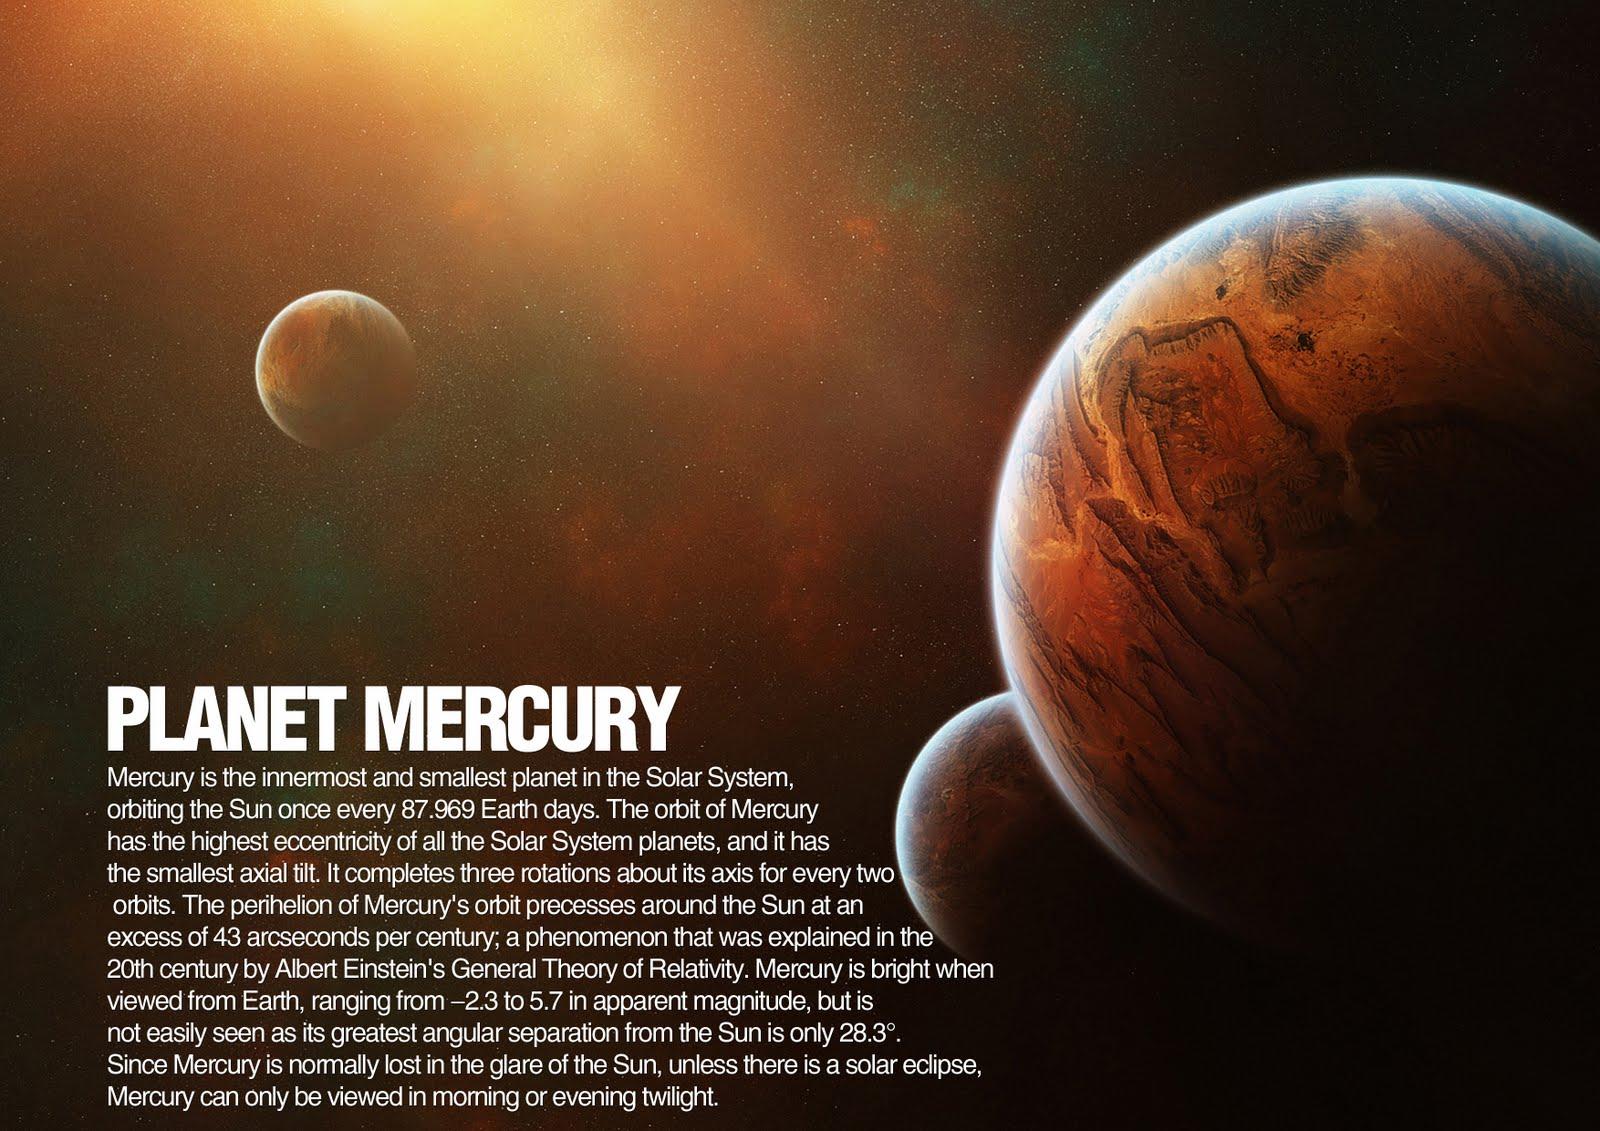 mercury planet essay The planet mercury raderek t halliburton baker college sci 321 principles of astronomy mark scheuern october 30, 2012 mercury - not the element on our.